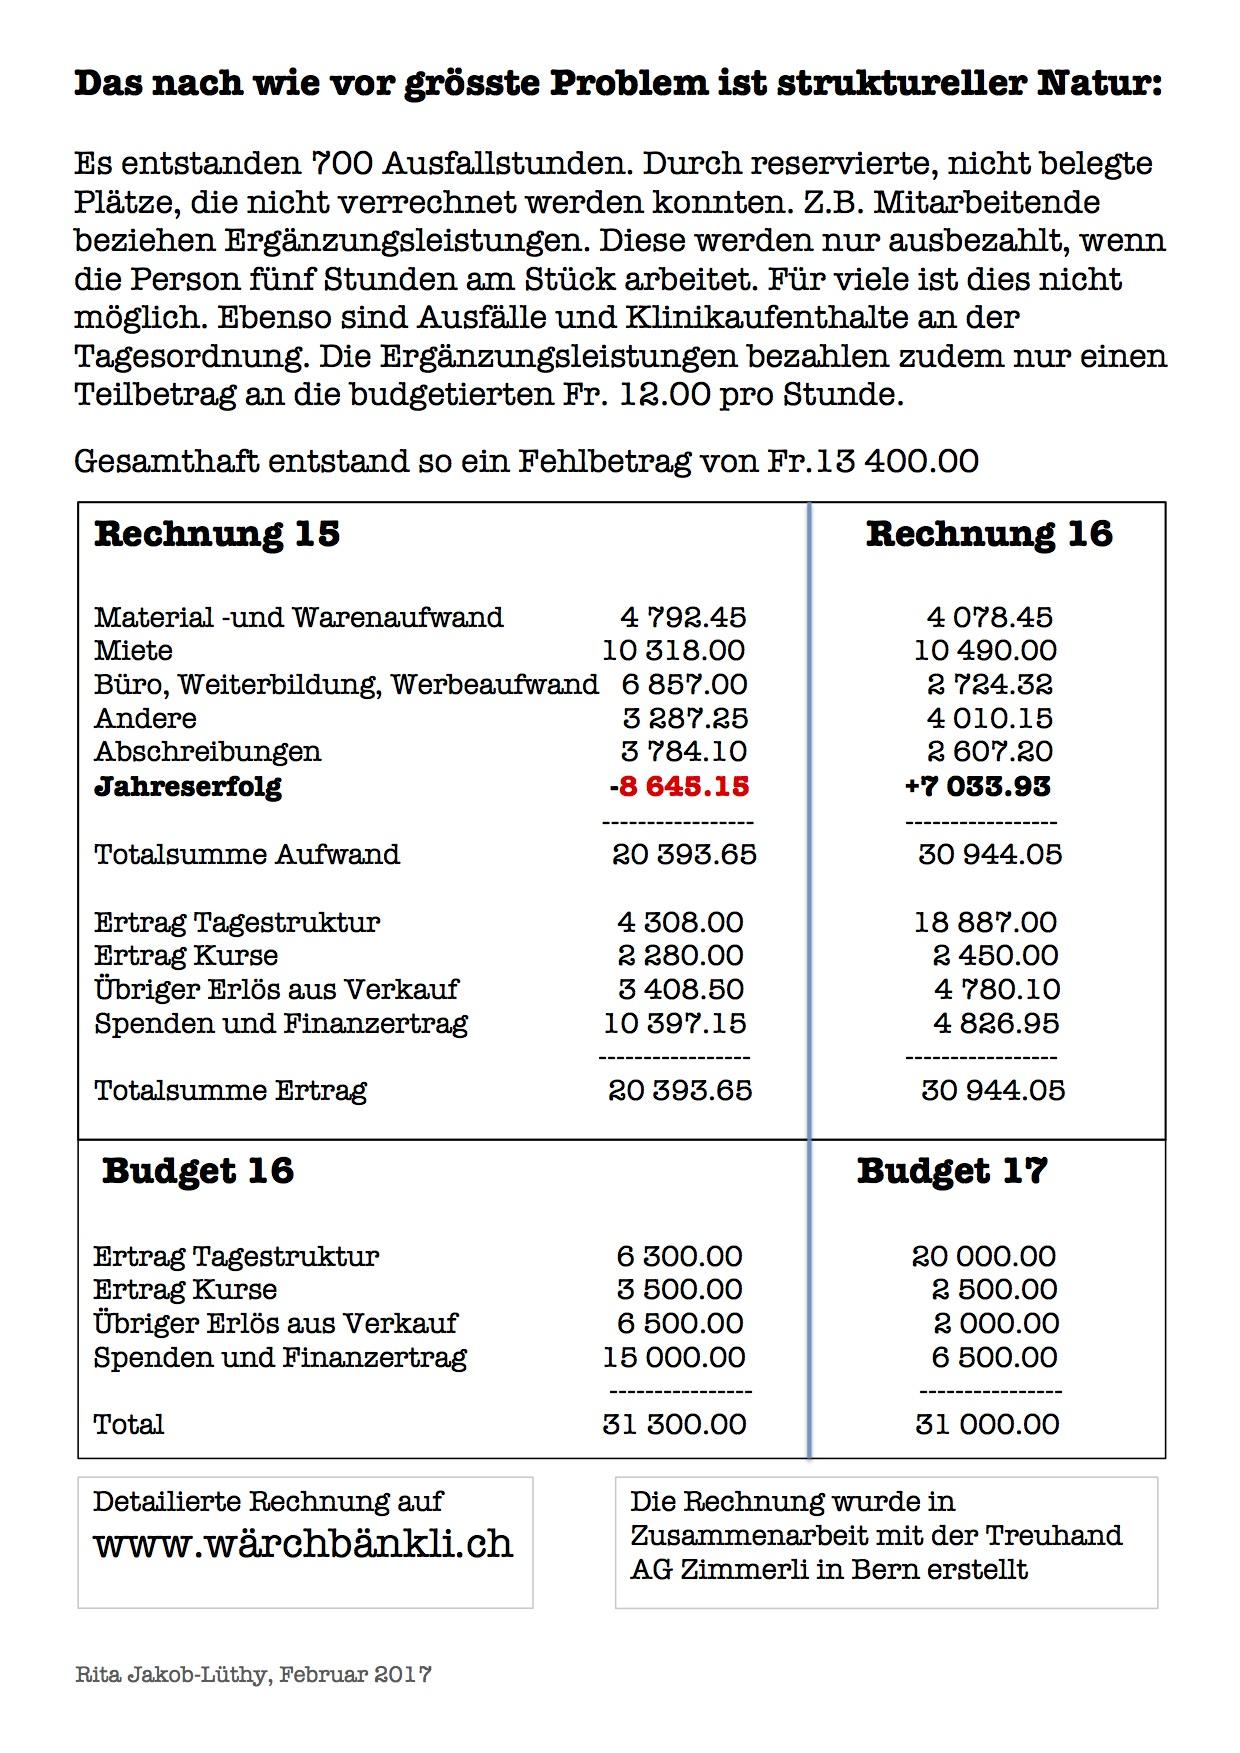 Jahresberich WB16   4